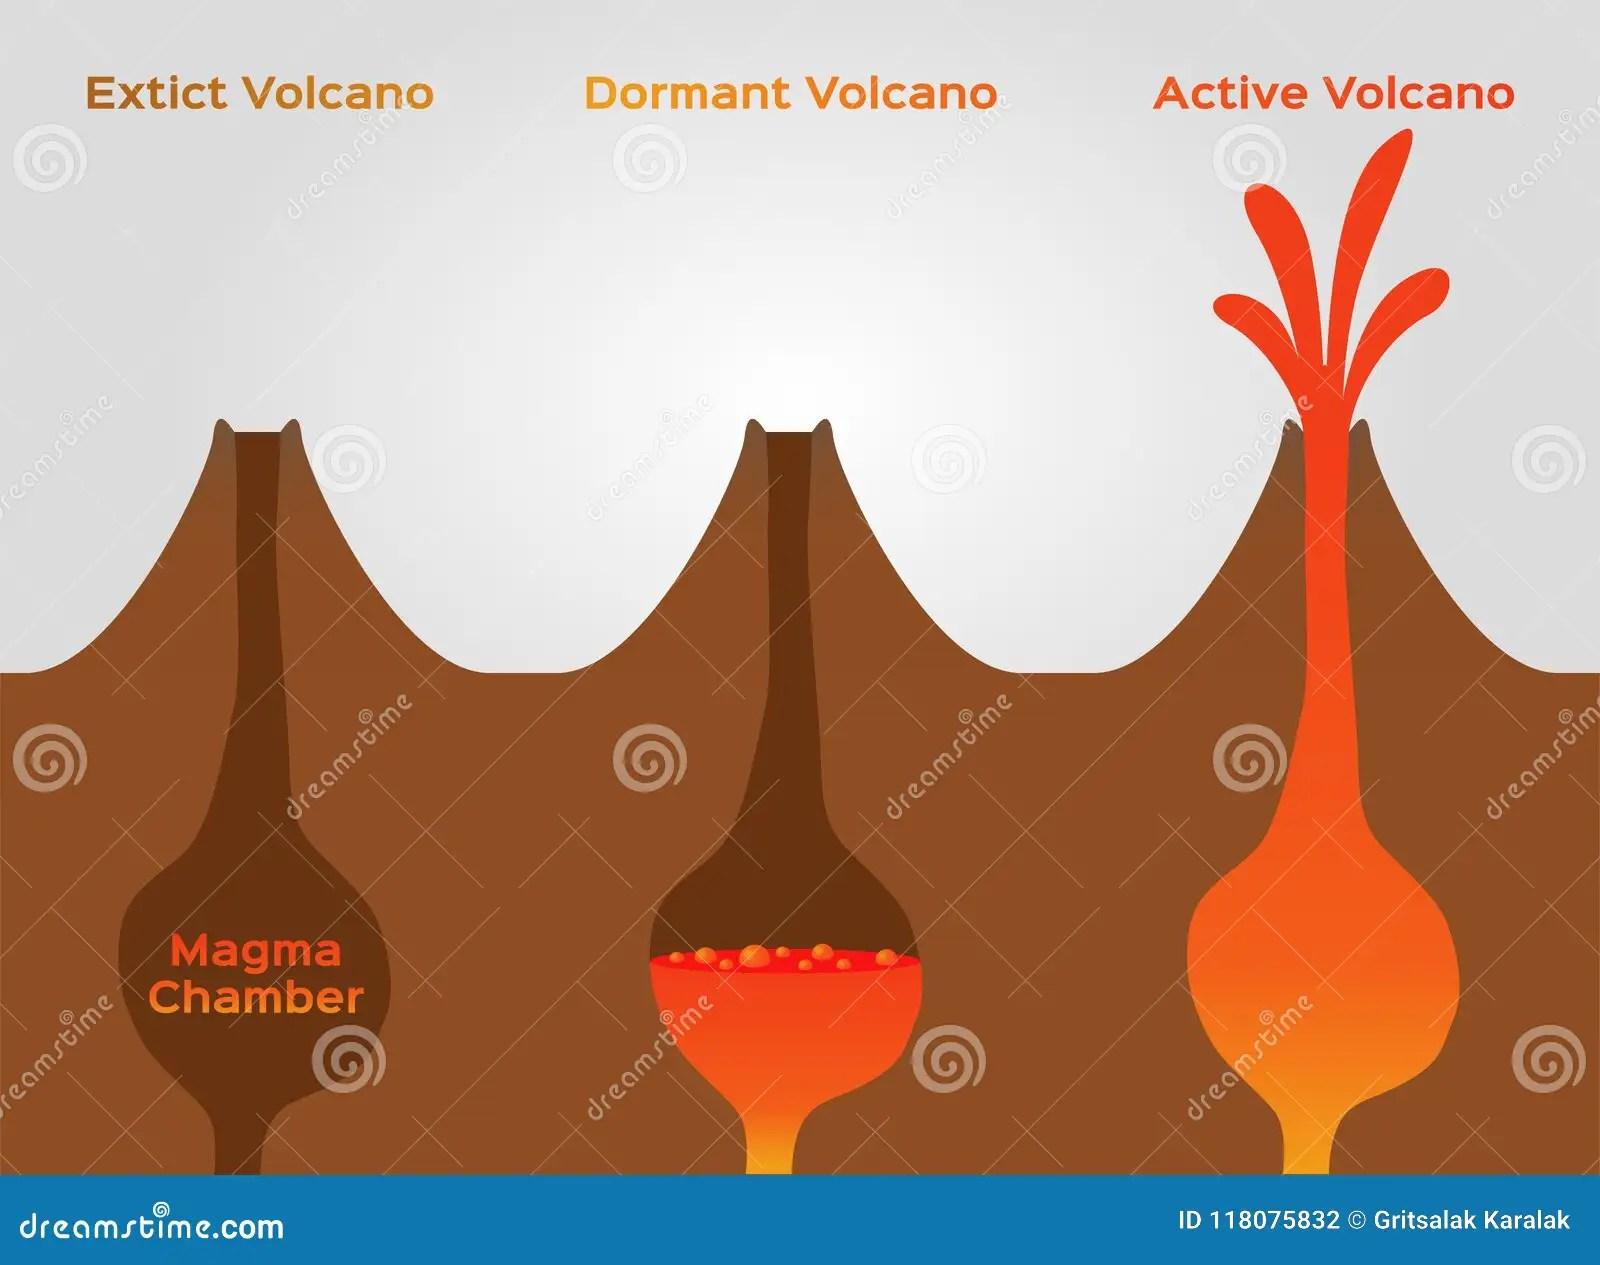 Volcano Stage Infographic Extinct Dormant And Active